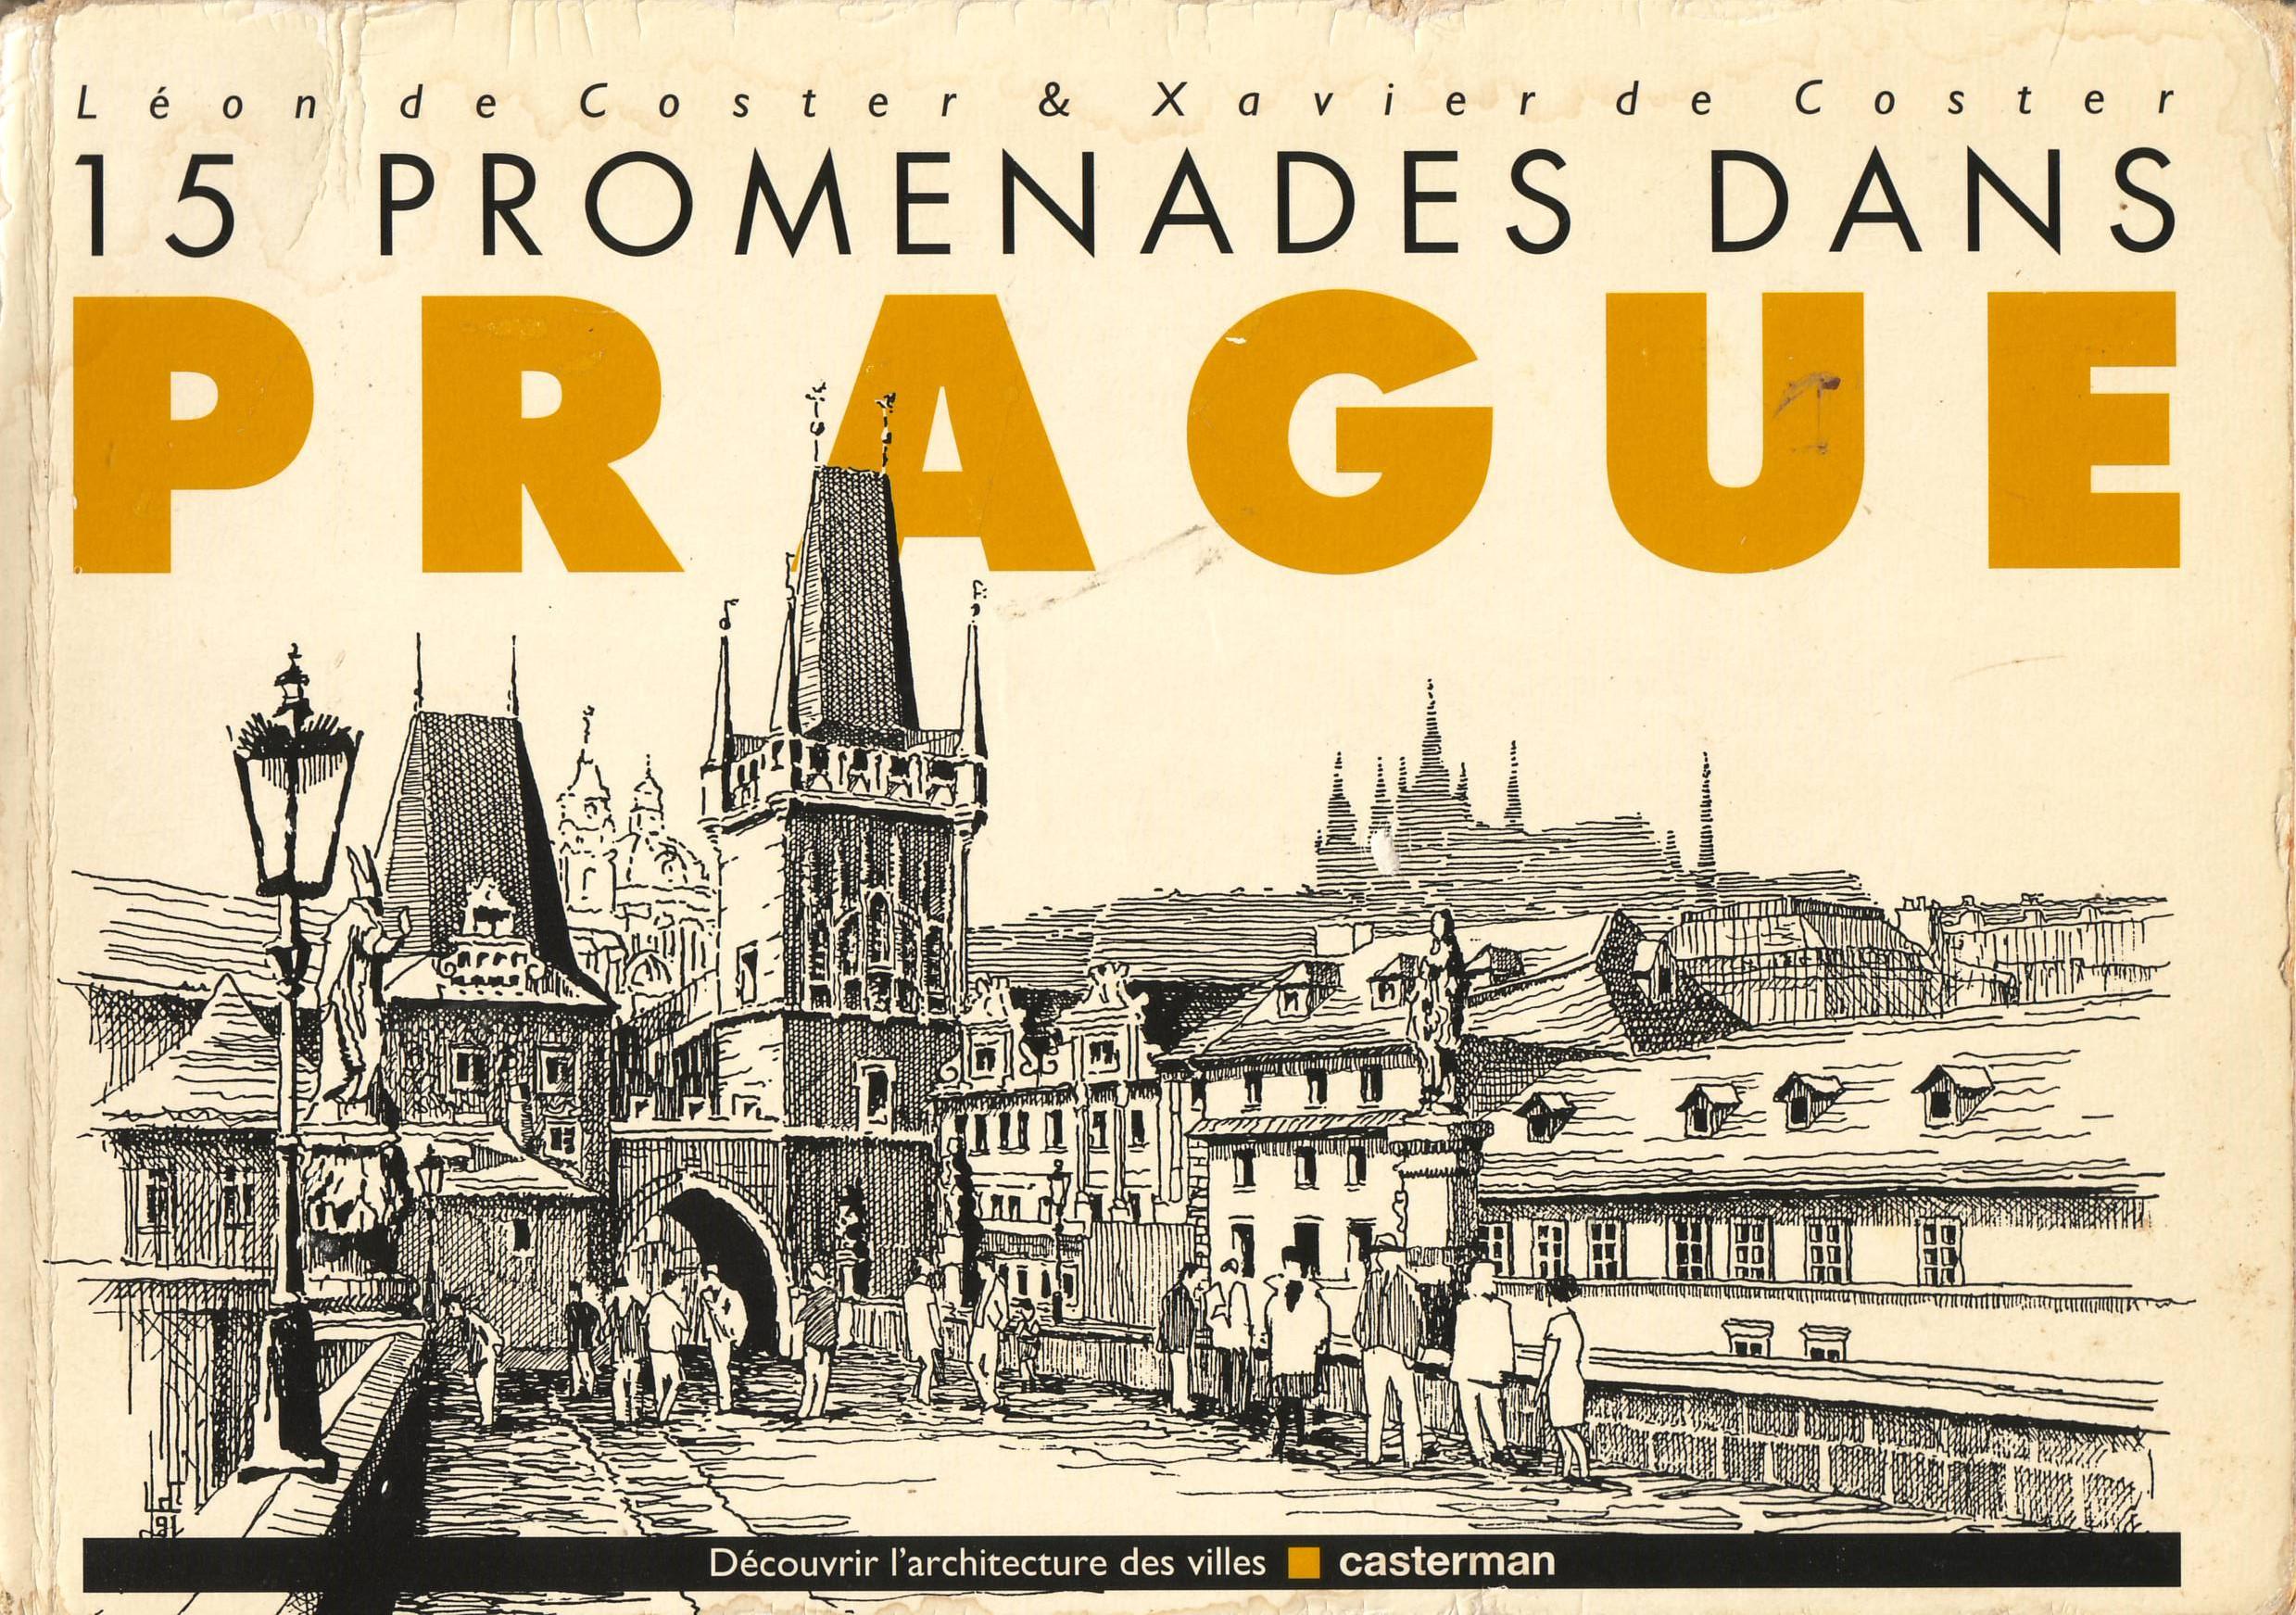 15 promenades dans Prague